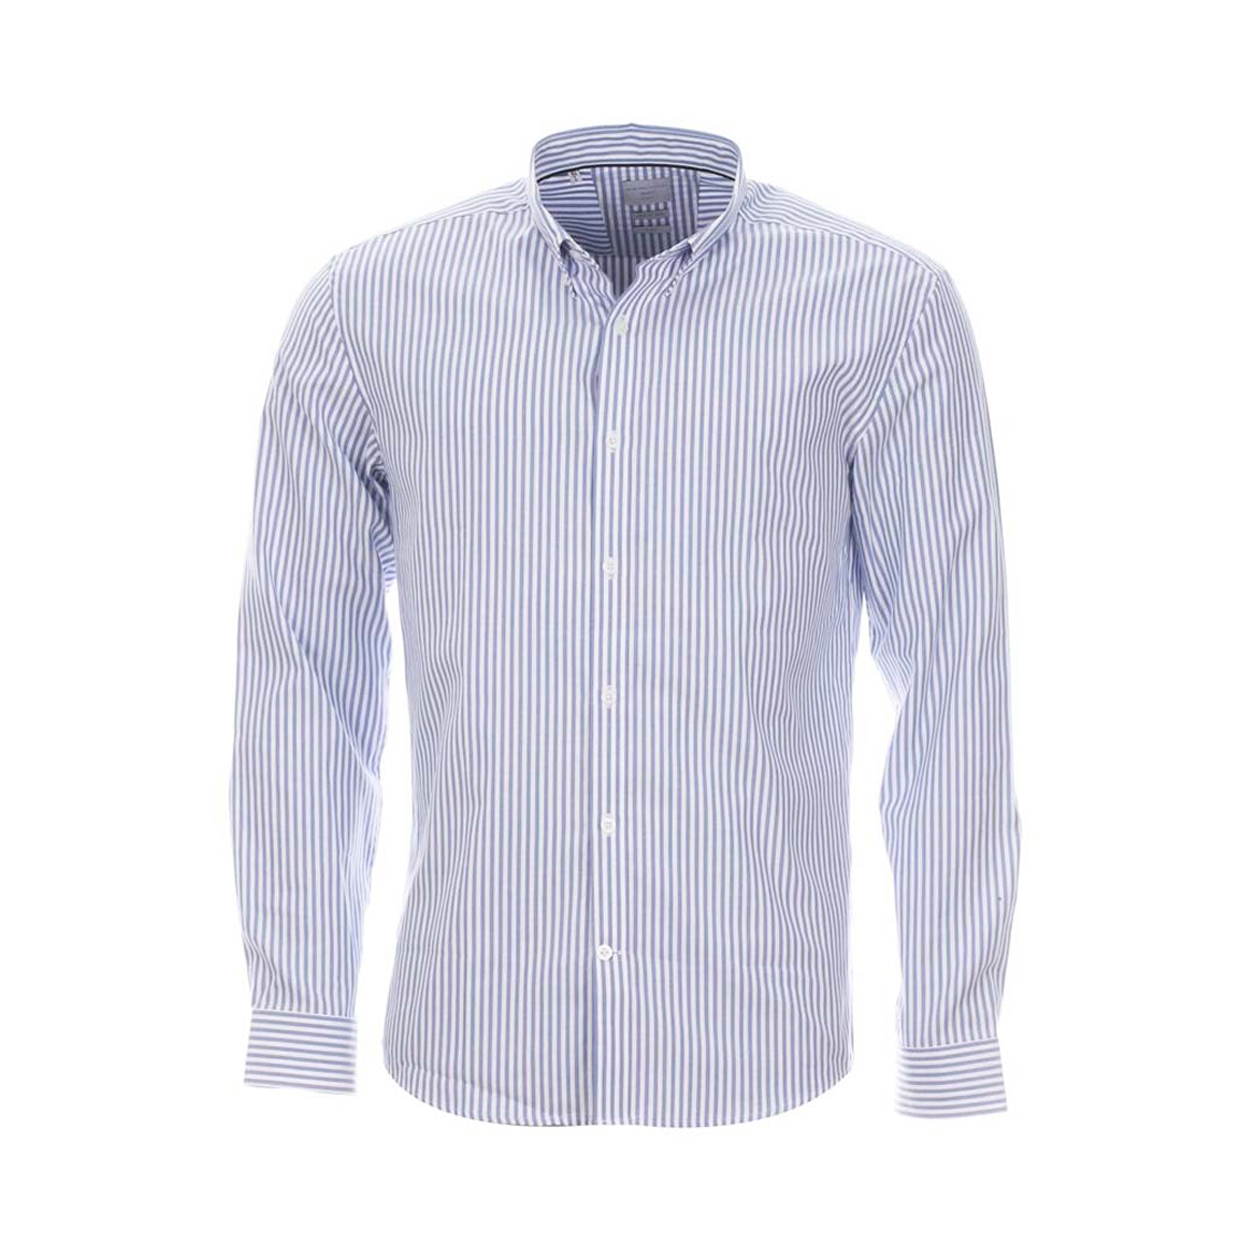 Chemise homme  à rayures verticales bleu clair et blanches